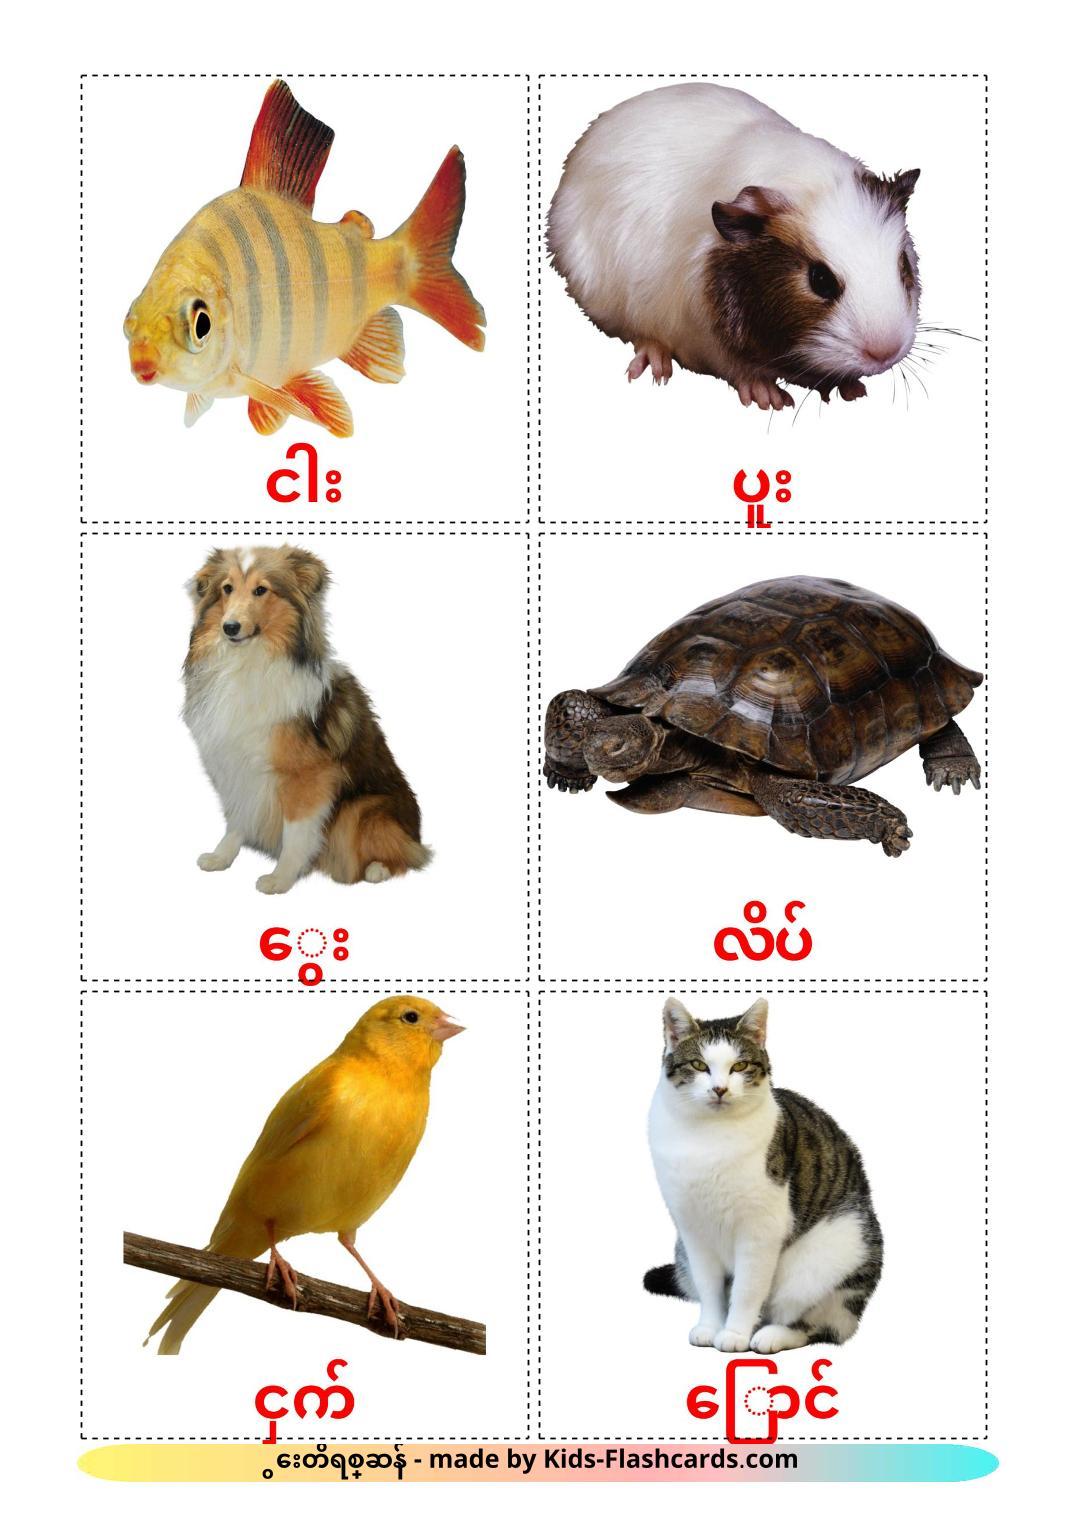 Domestic animals - 10 Free Printable azerbaijani(cyrillic) Flashcards